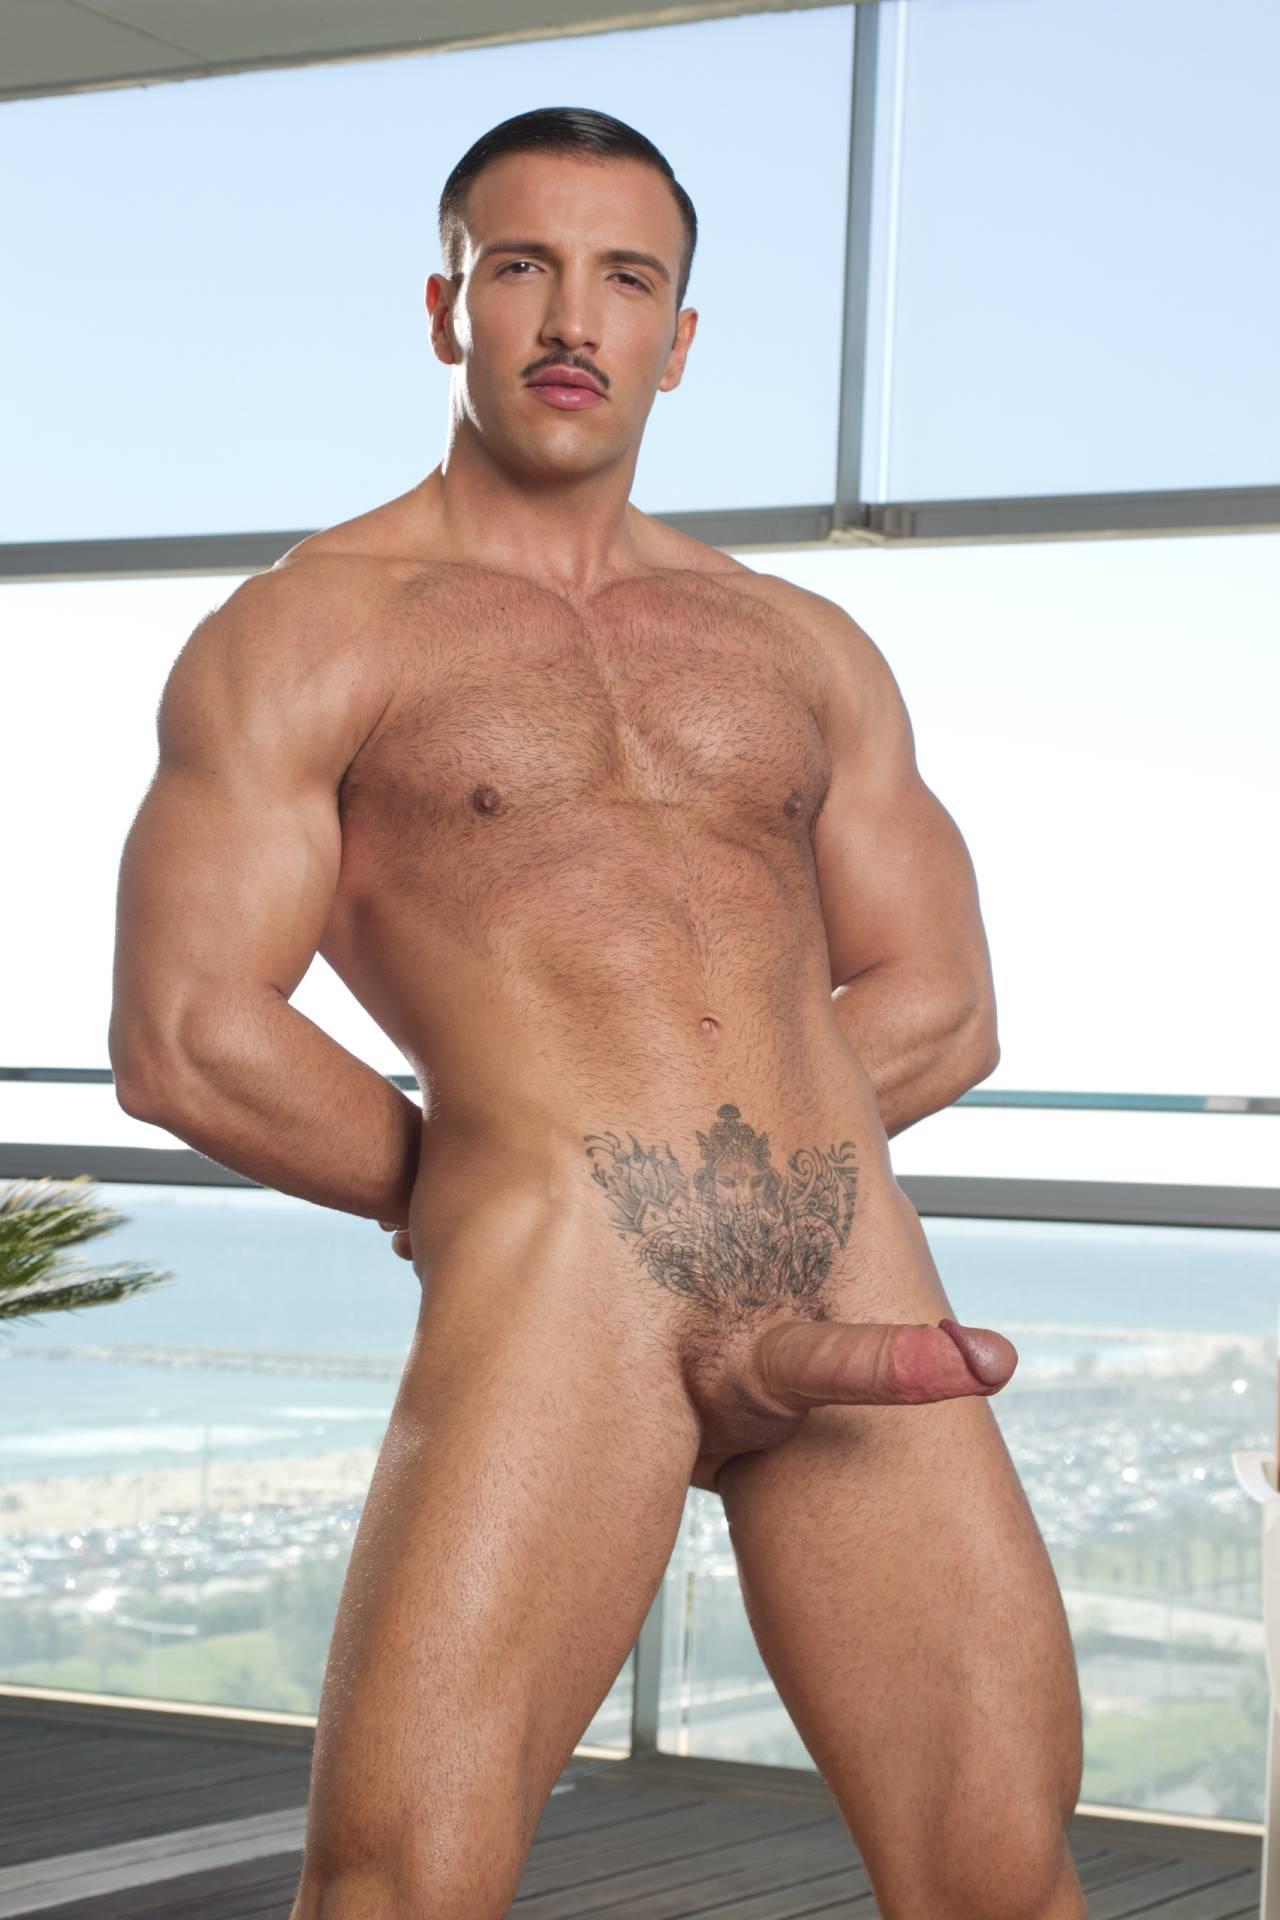 Passion Do Donato Reyes Porn showing xxx images for donato reyes xxx | www.pornsink